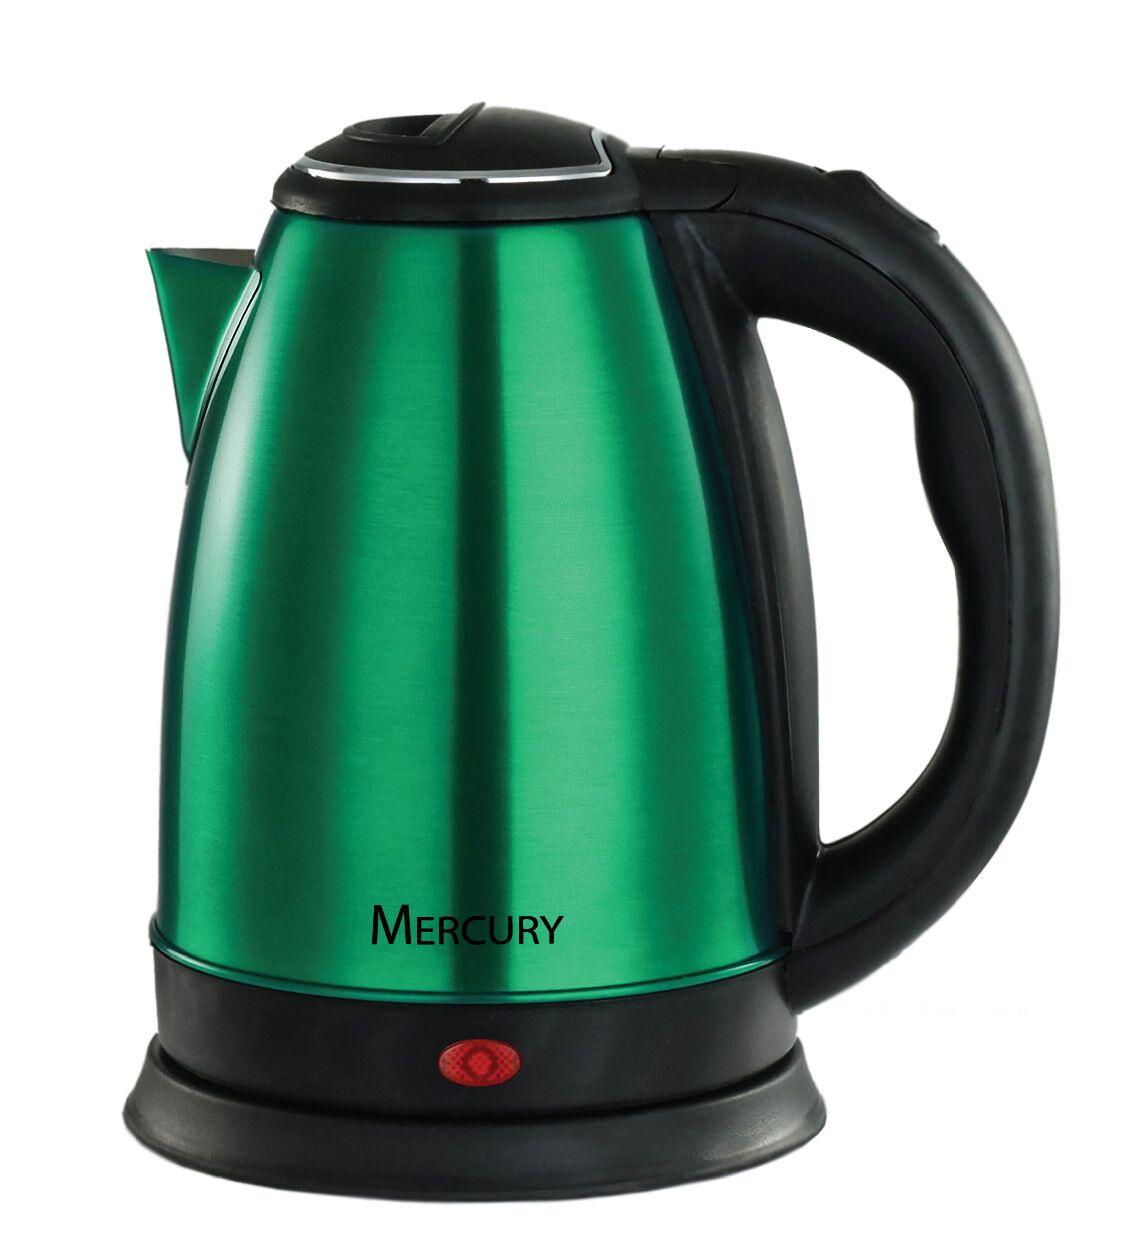 Электрический чайник Mercury Haus MC-6620, темно-зеленый электрический чайник mercury haus mercury mc 6621